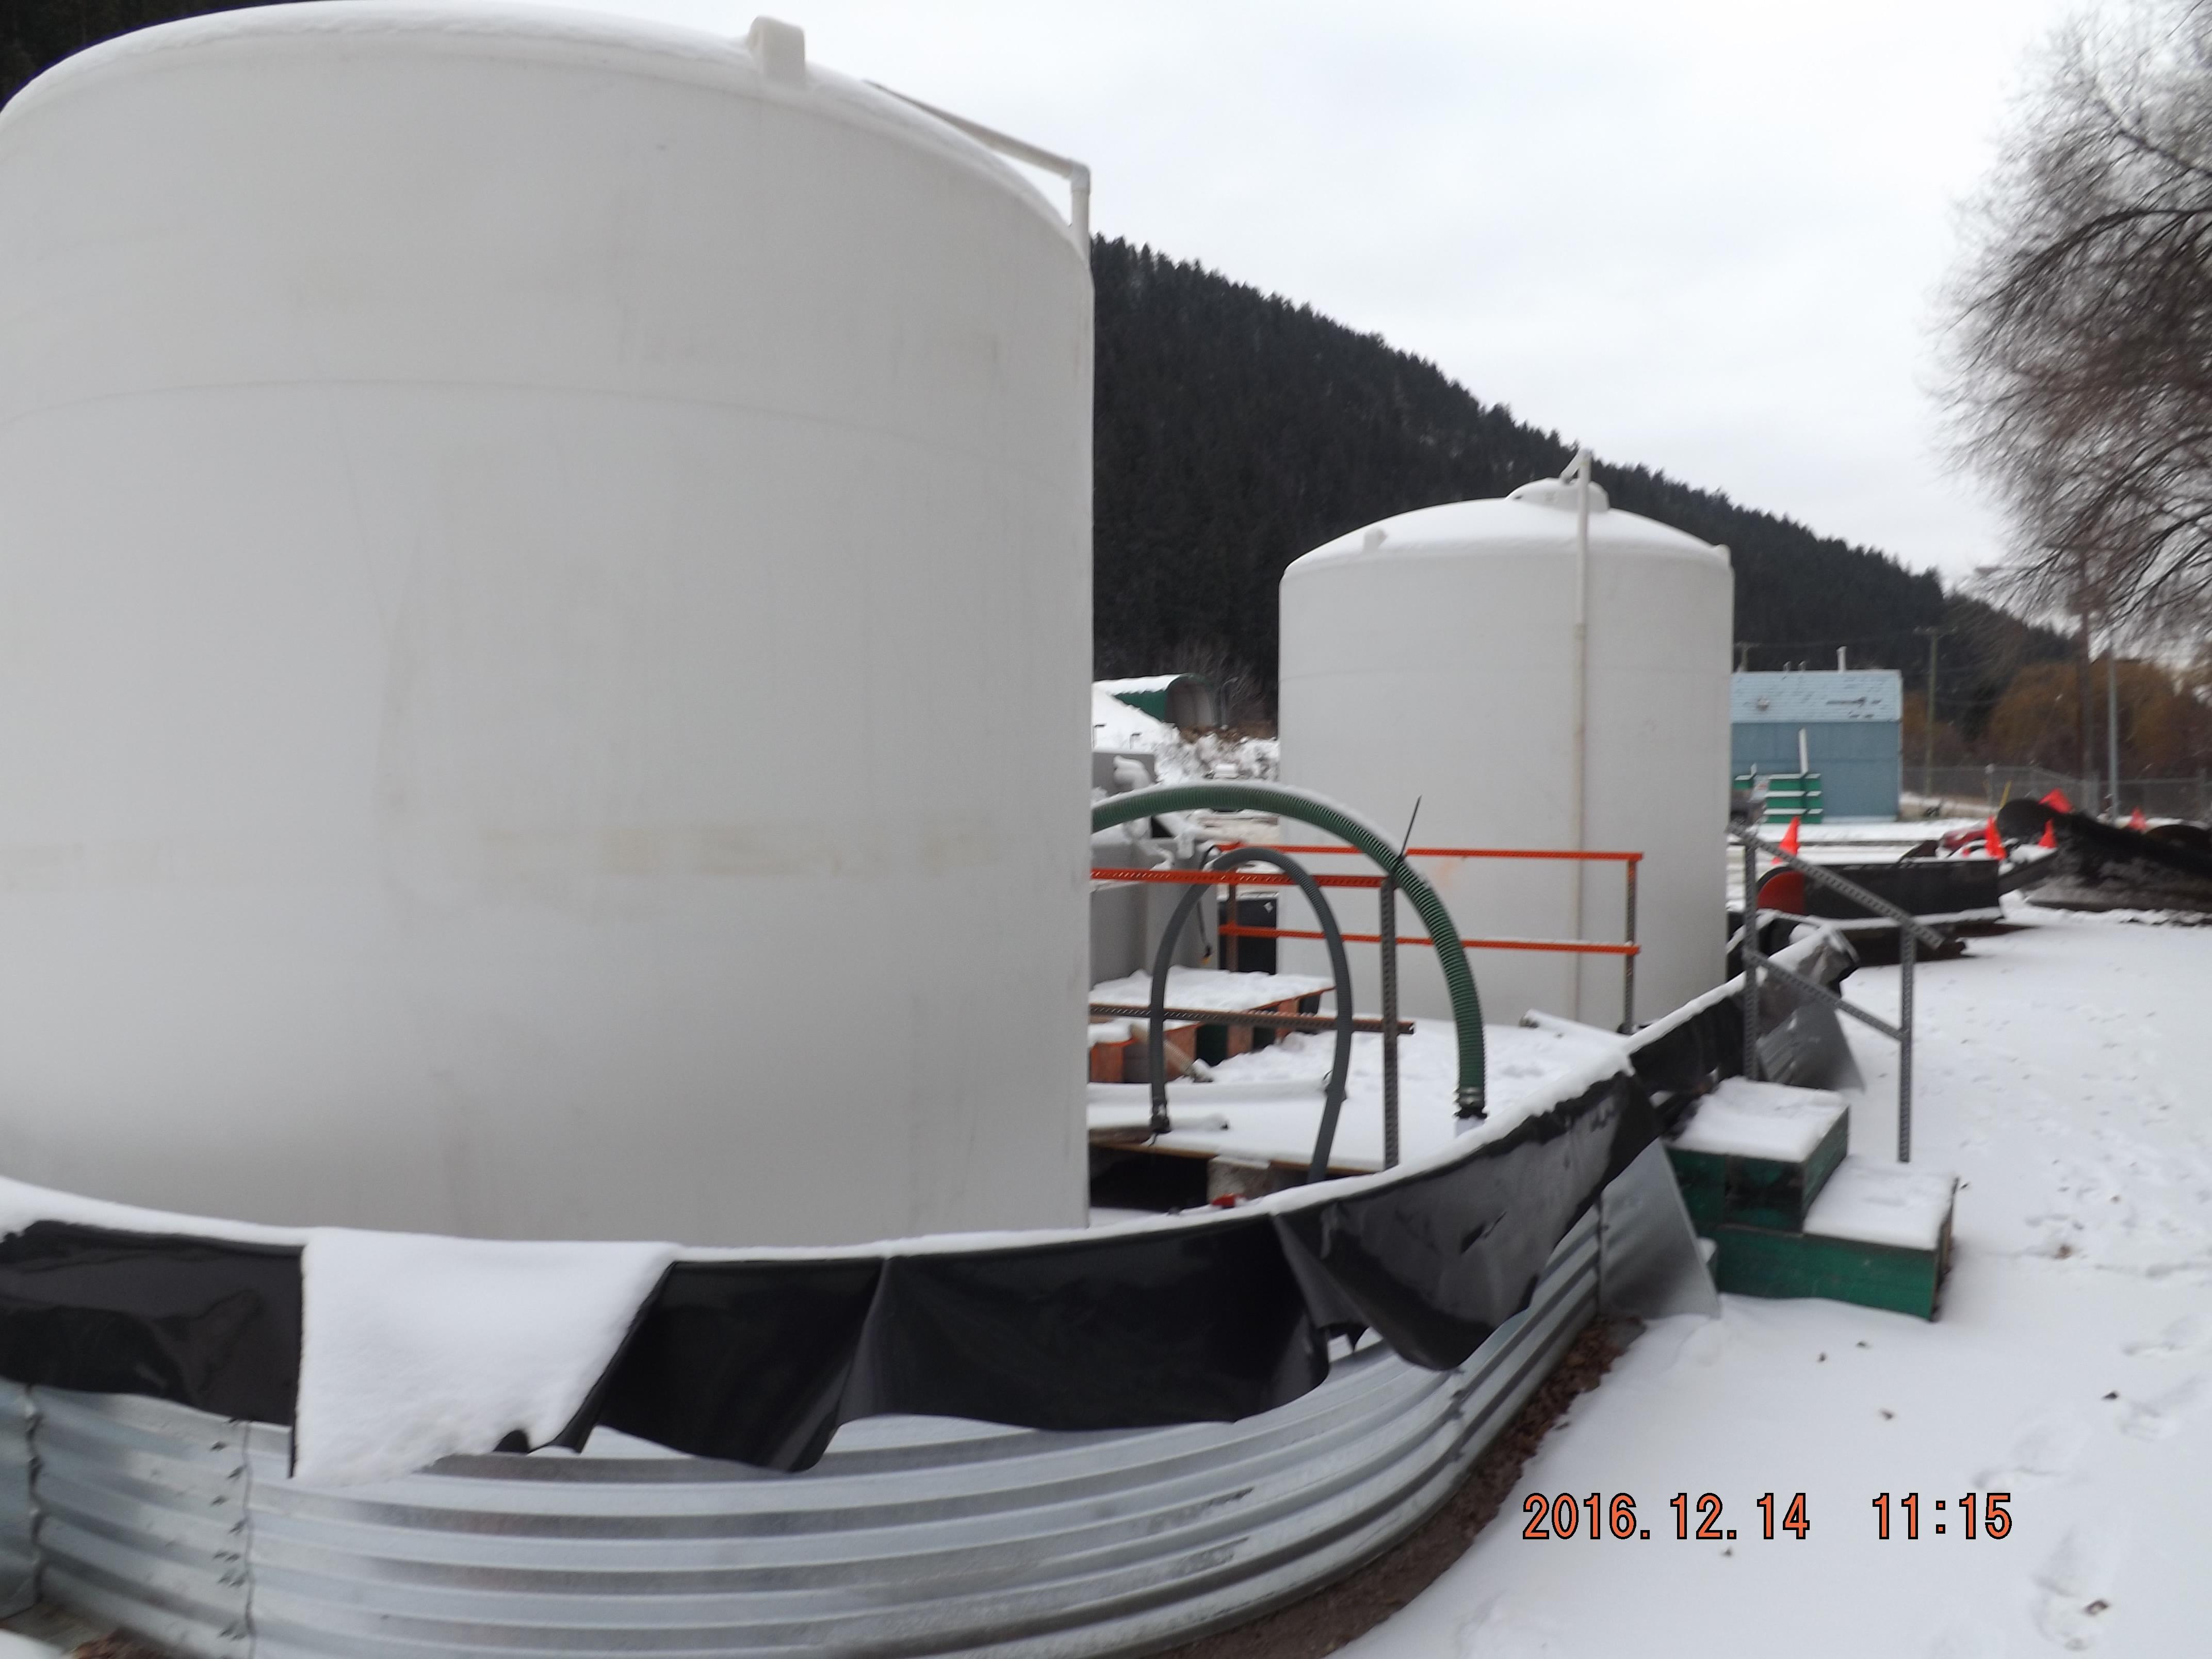 Brine making facility